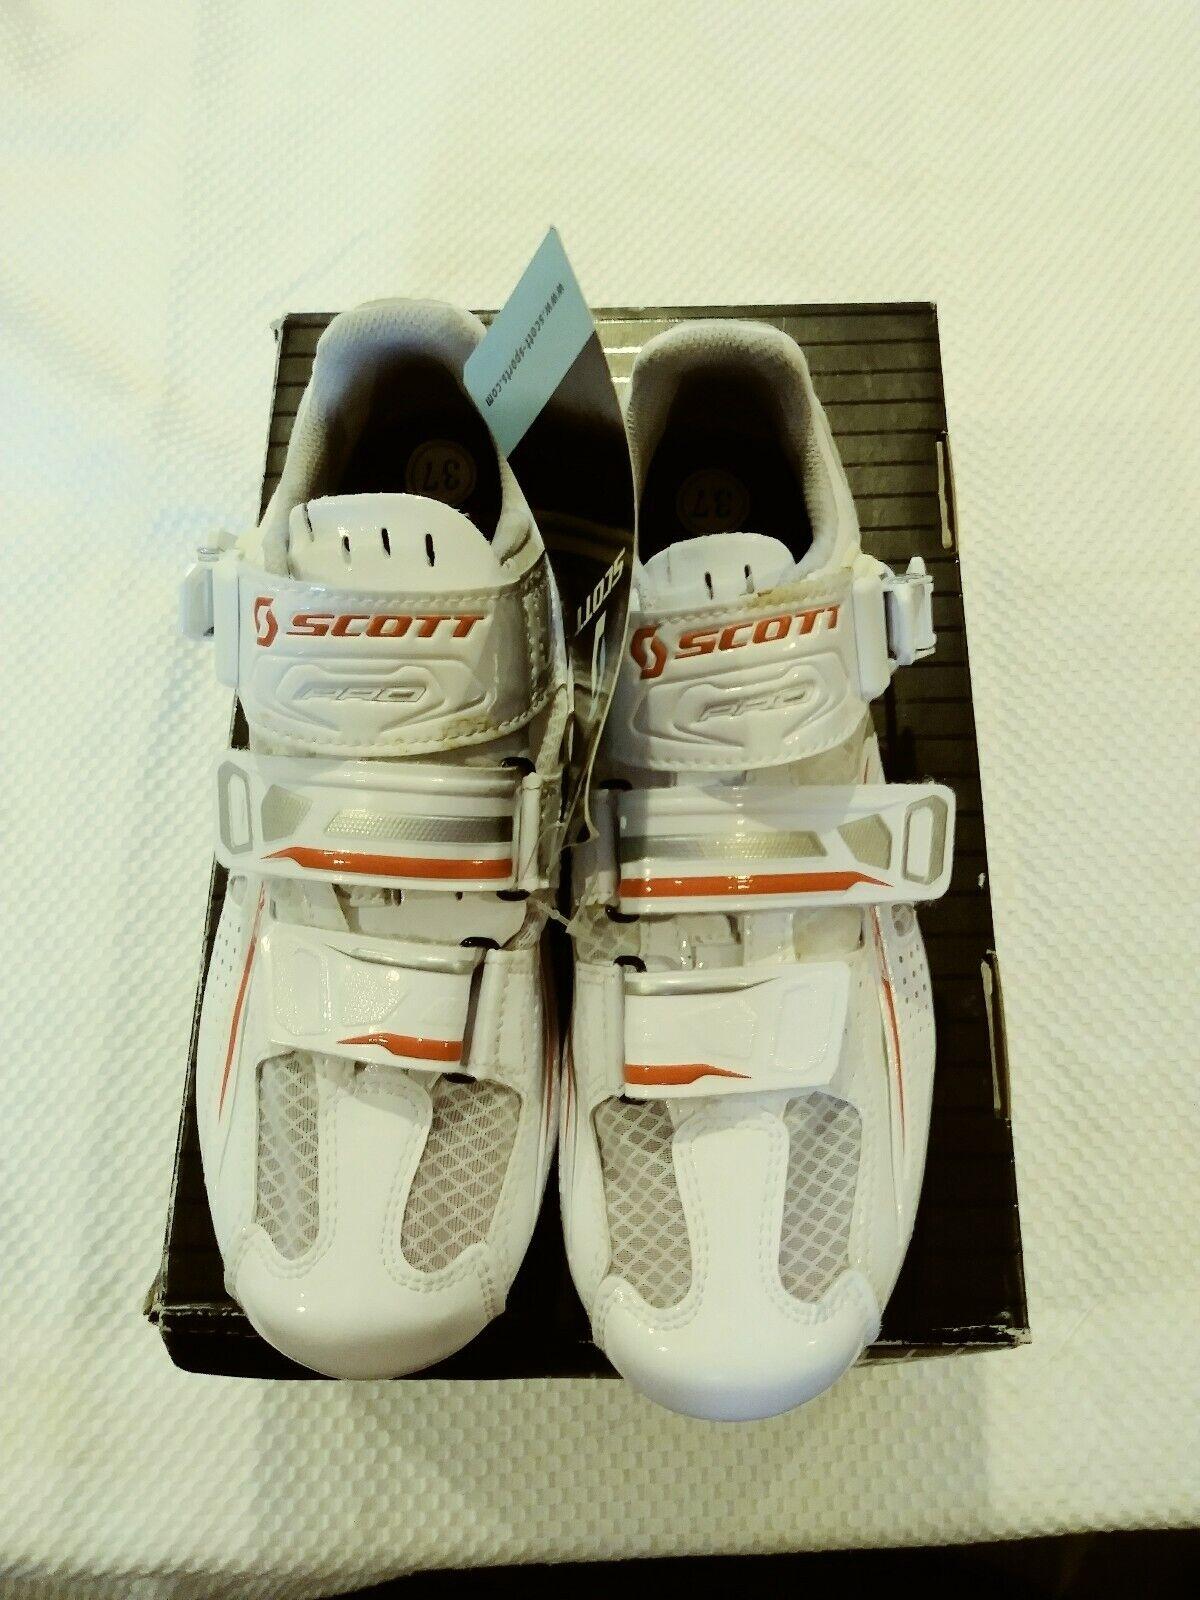 New Women's Scott Road Pro Lady Bike shoes White Gloss US 6 221486-2979003